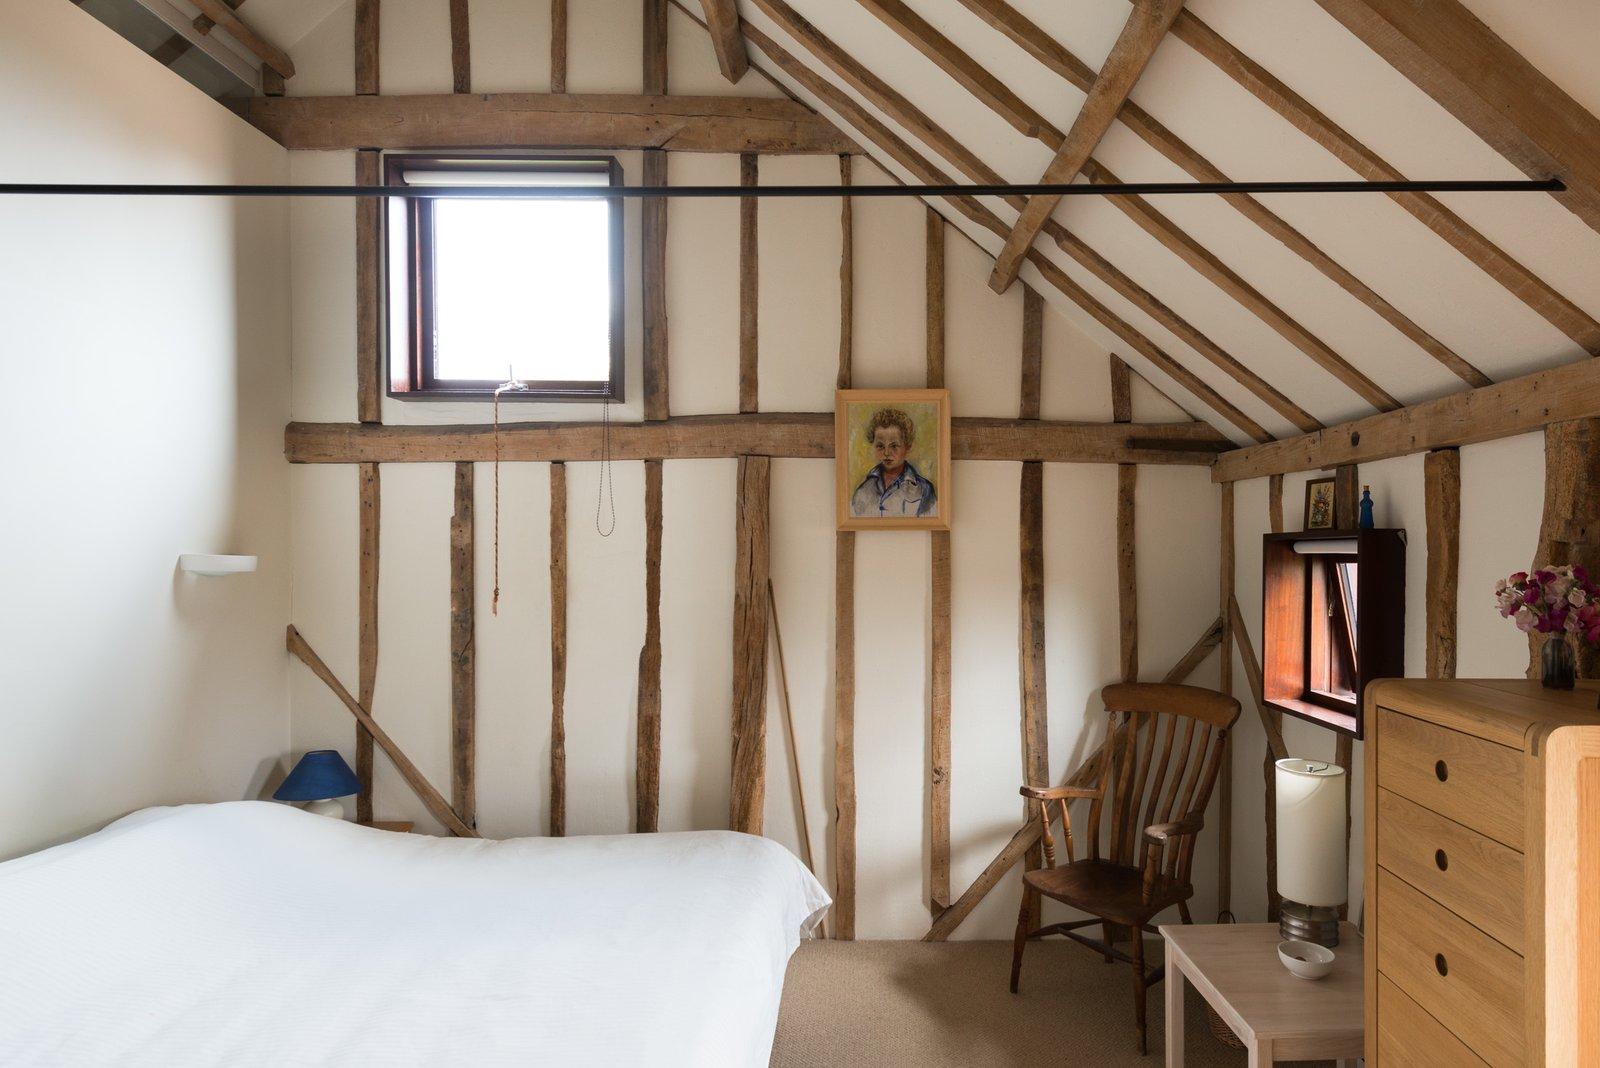 Simple farmhouse bedroom style.